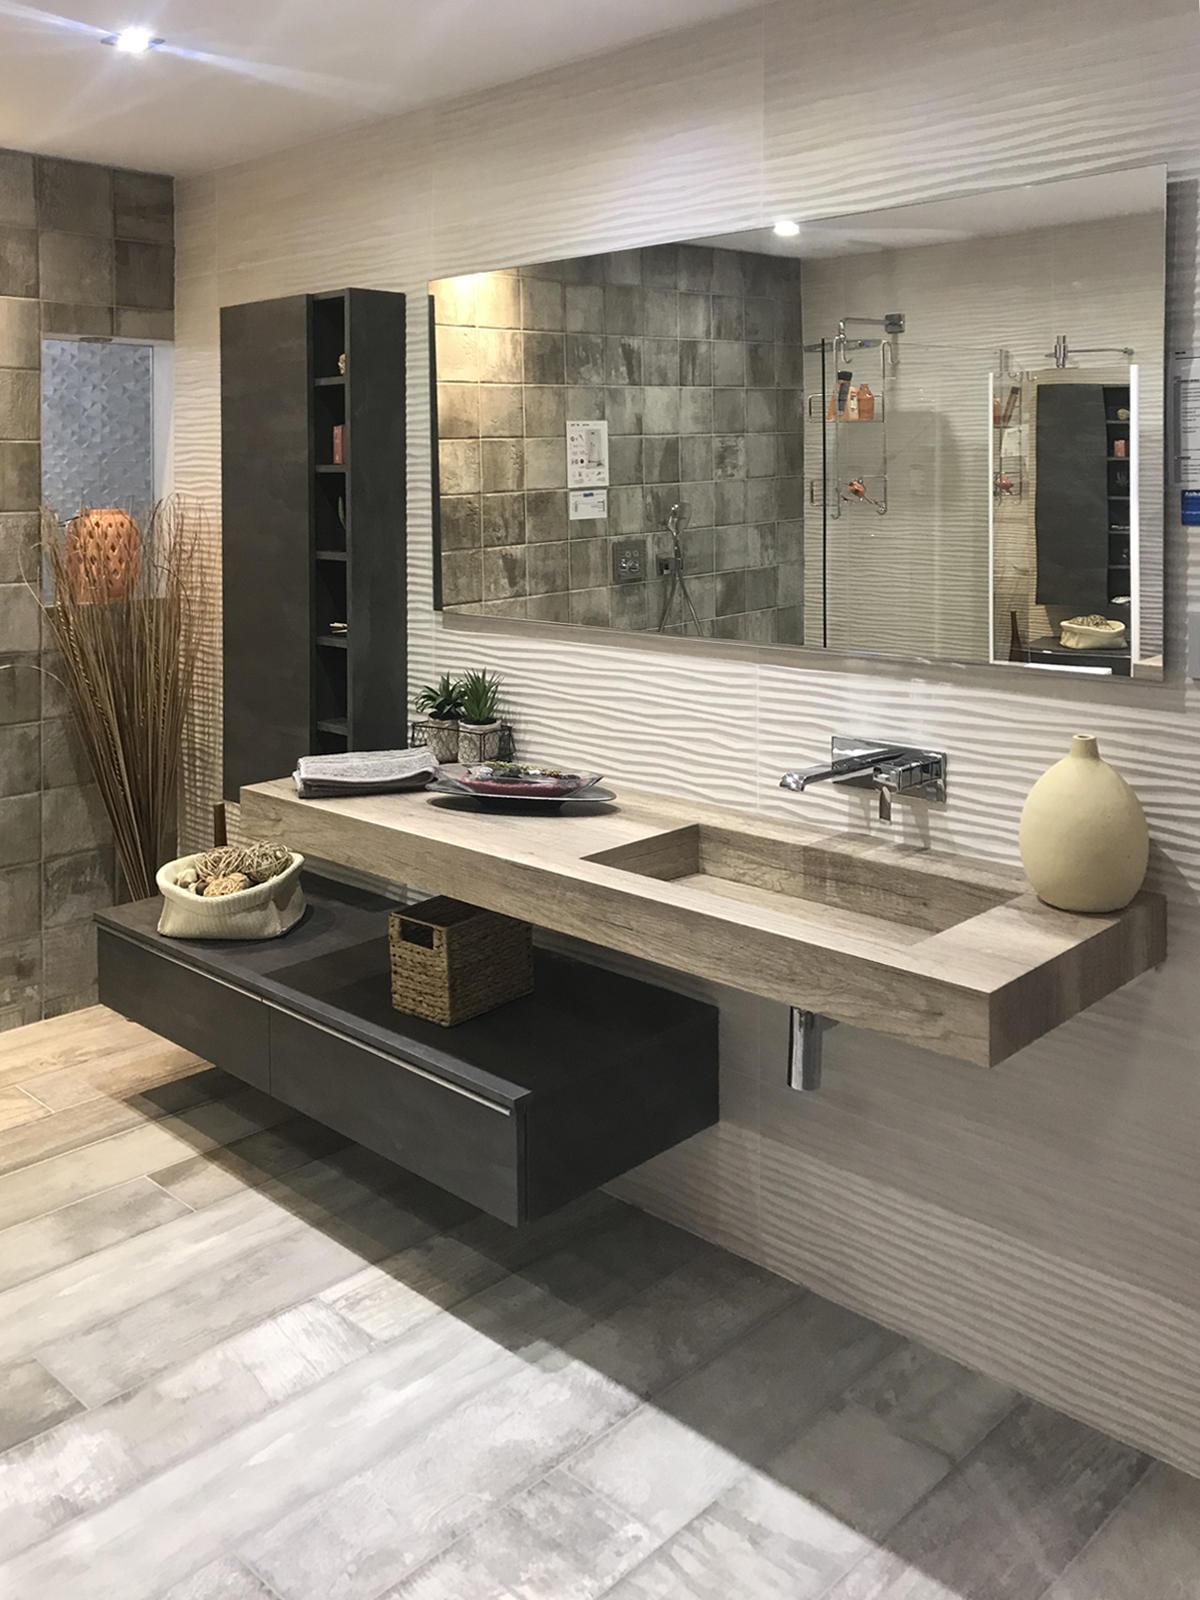 Implantation extenso natura r ussie meubles de salle de - Fabricant meuble de salle de bain ...